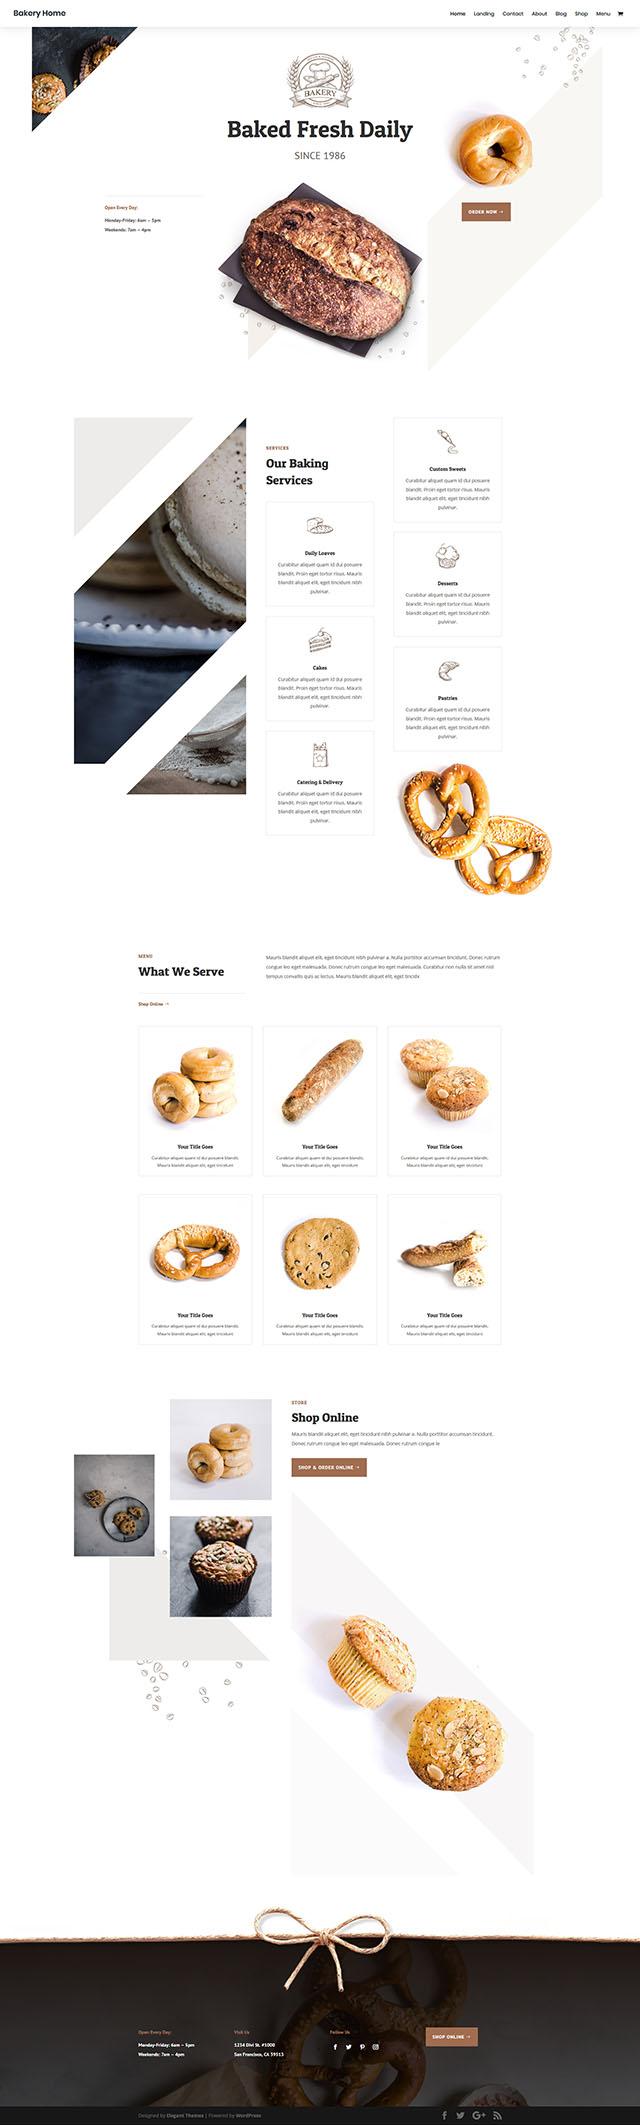 FREE Bakery Layout Pack 免費下載麵包店示範頁面組合